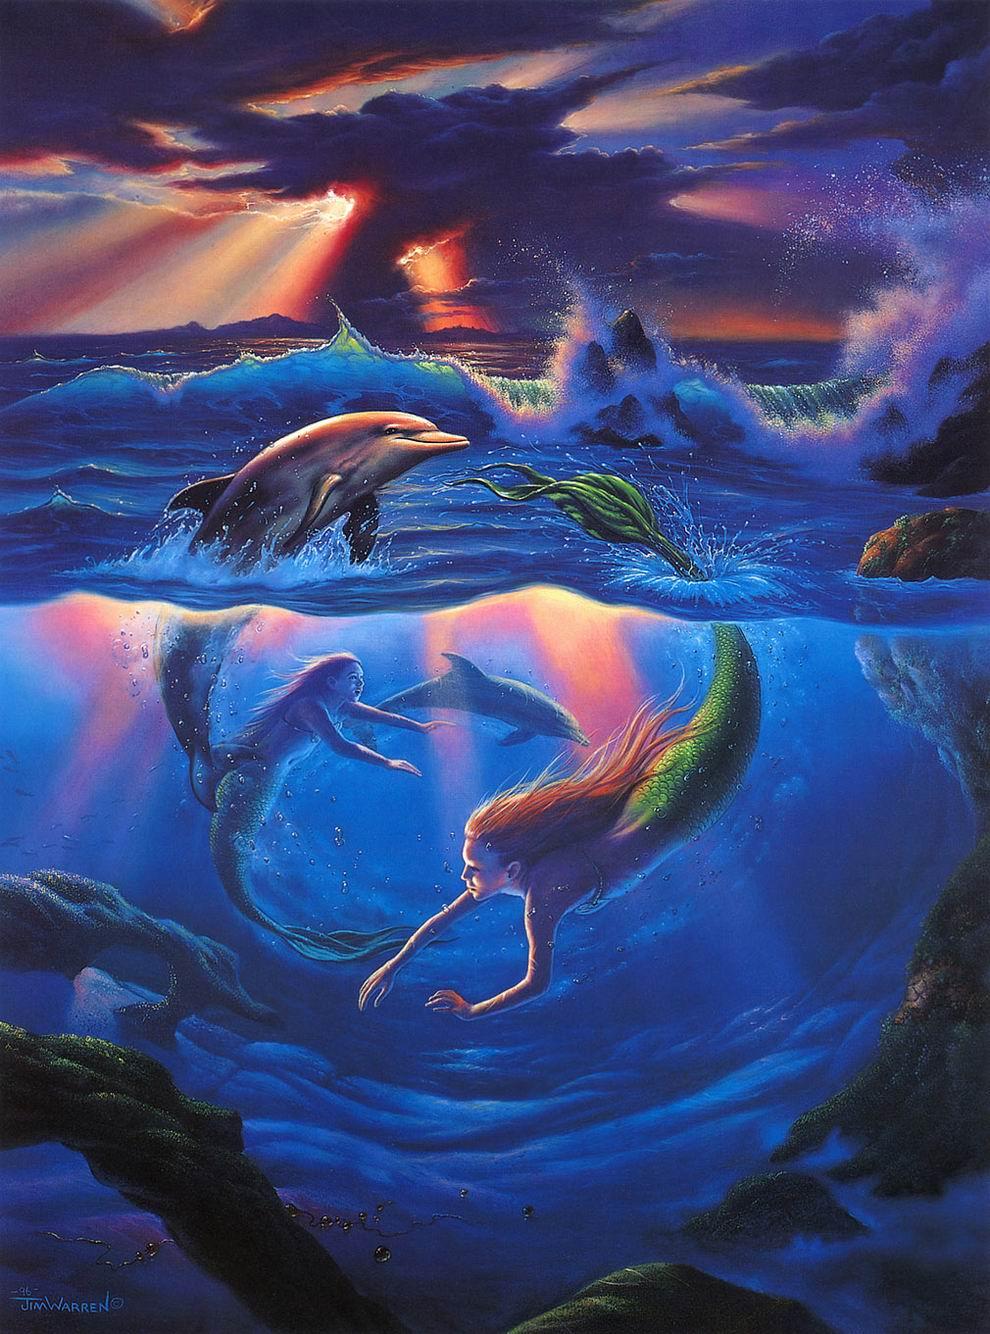 Cute Mermaids Wallpaper Jim Warren Art Xcitefun Net